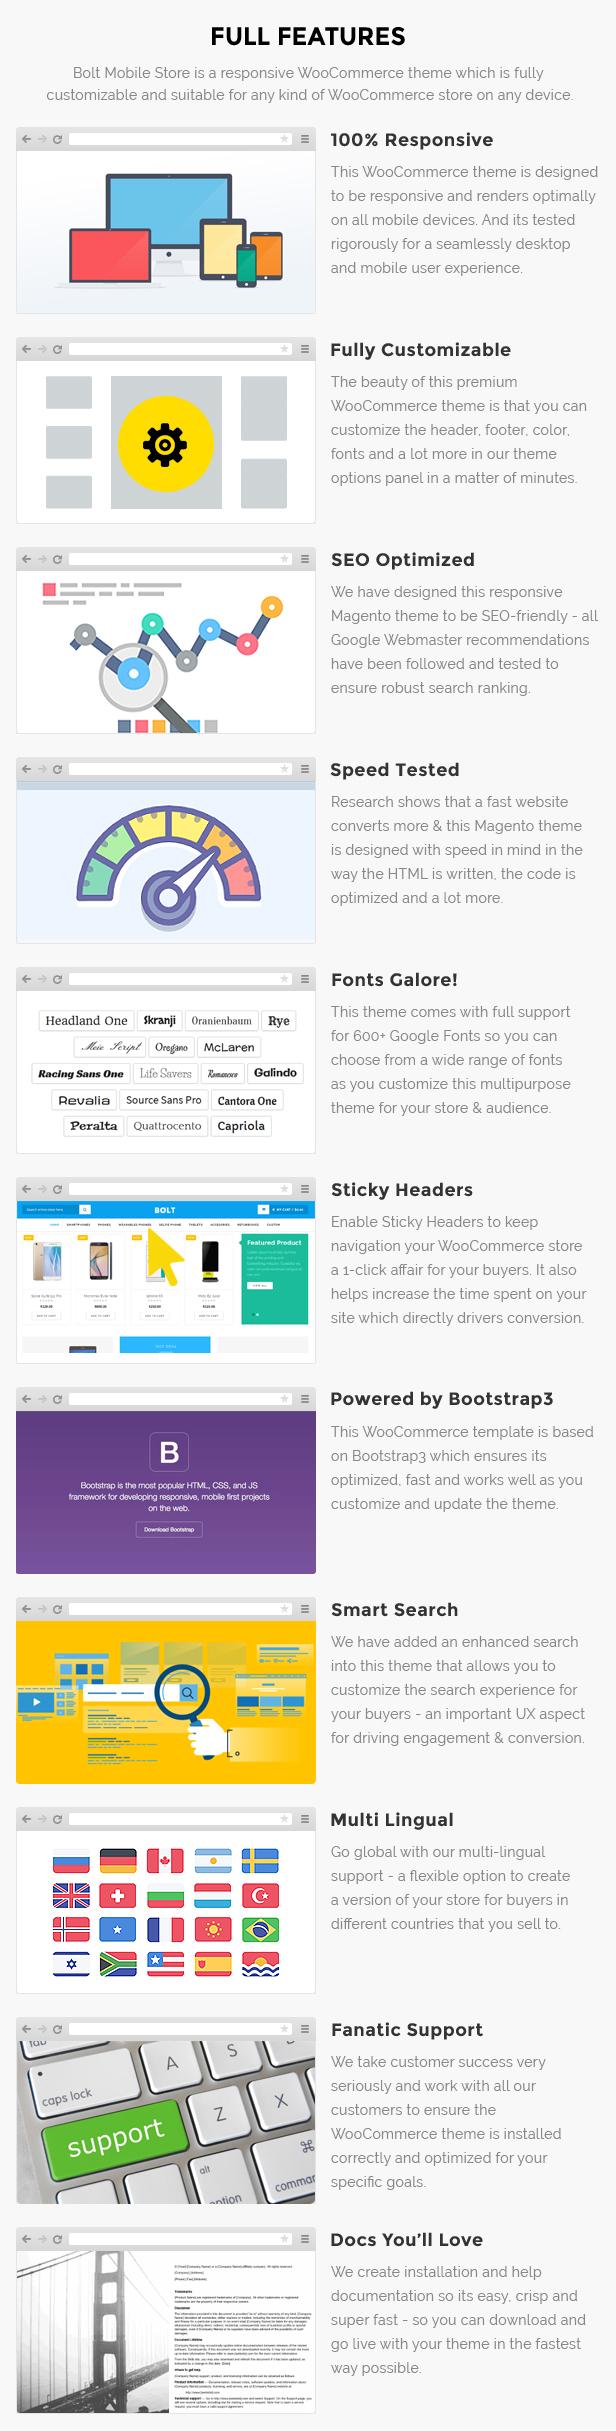 Bolt - Mobile Store WooCommerce WordPress Theme